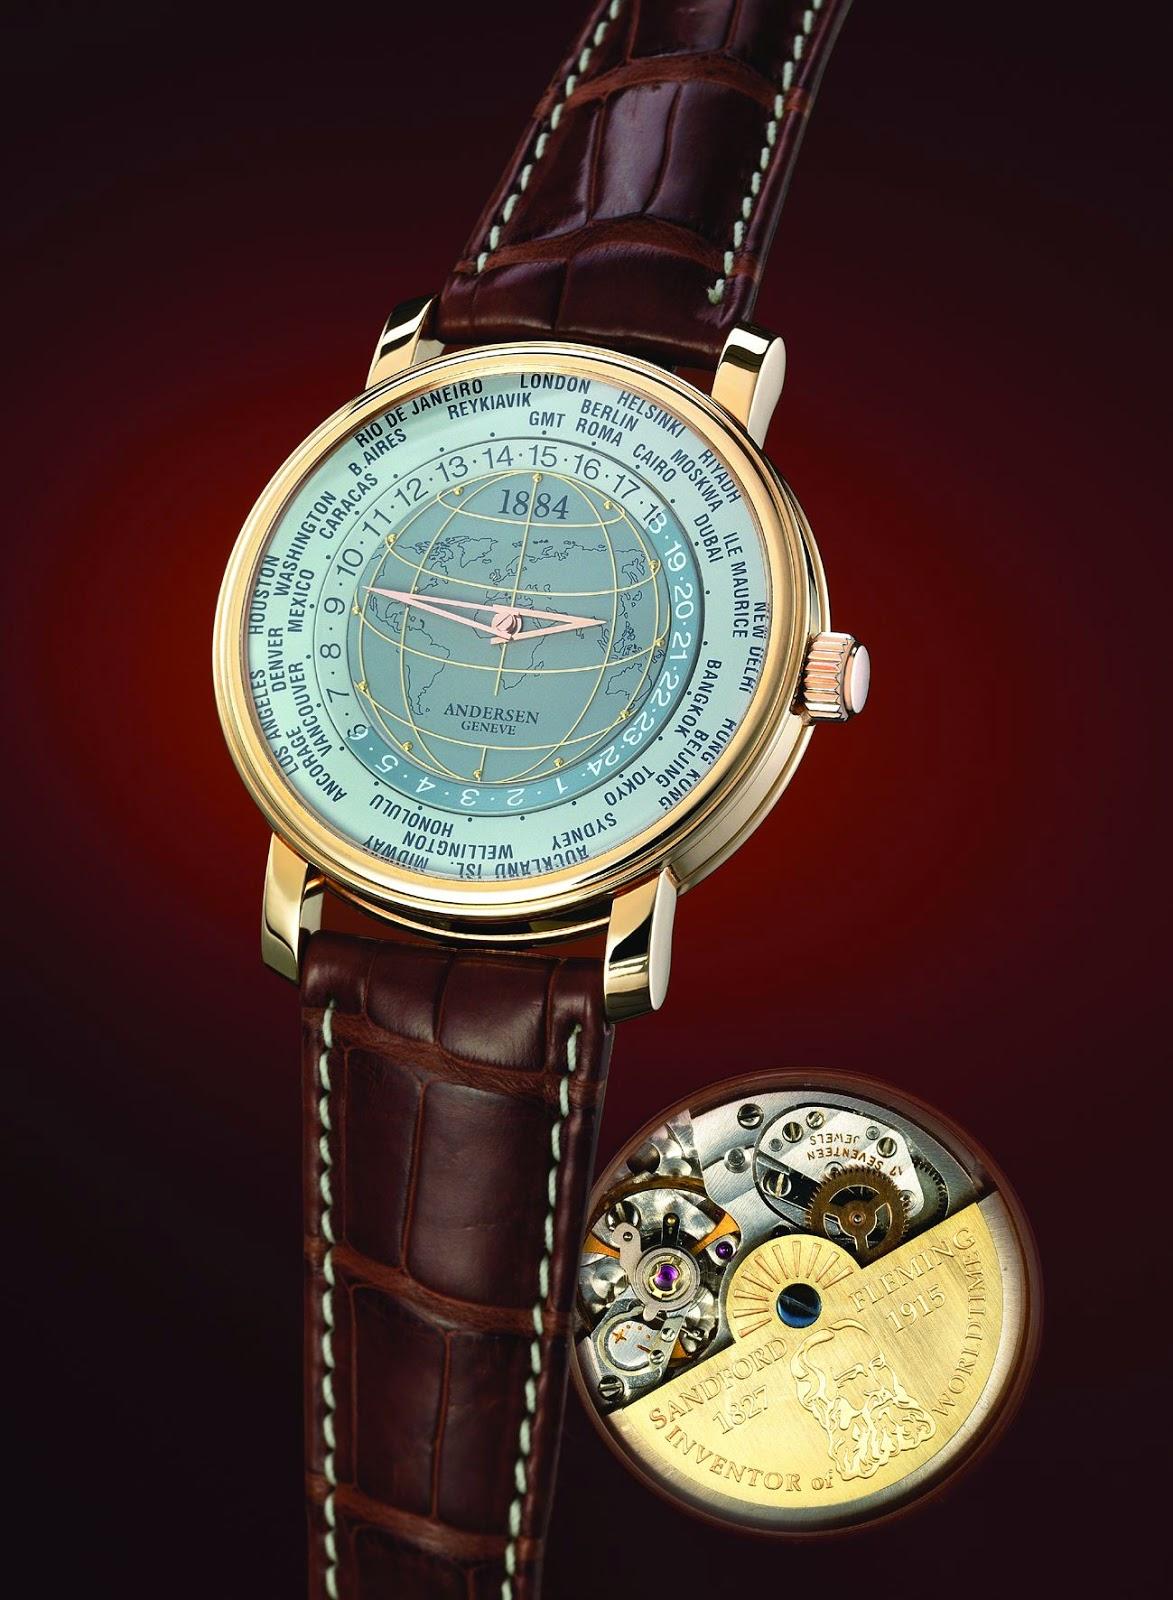 Anderesen Geneve 1884 World Time Watch (2004)